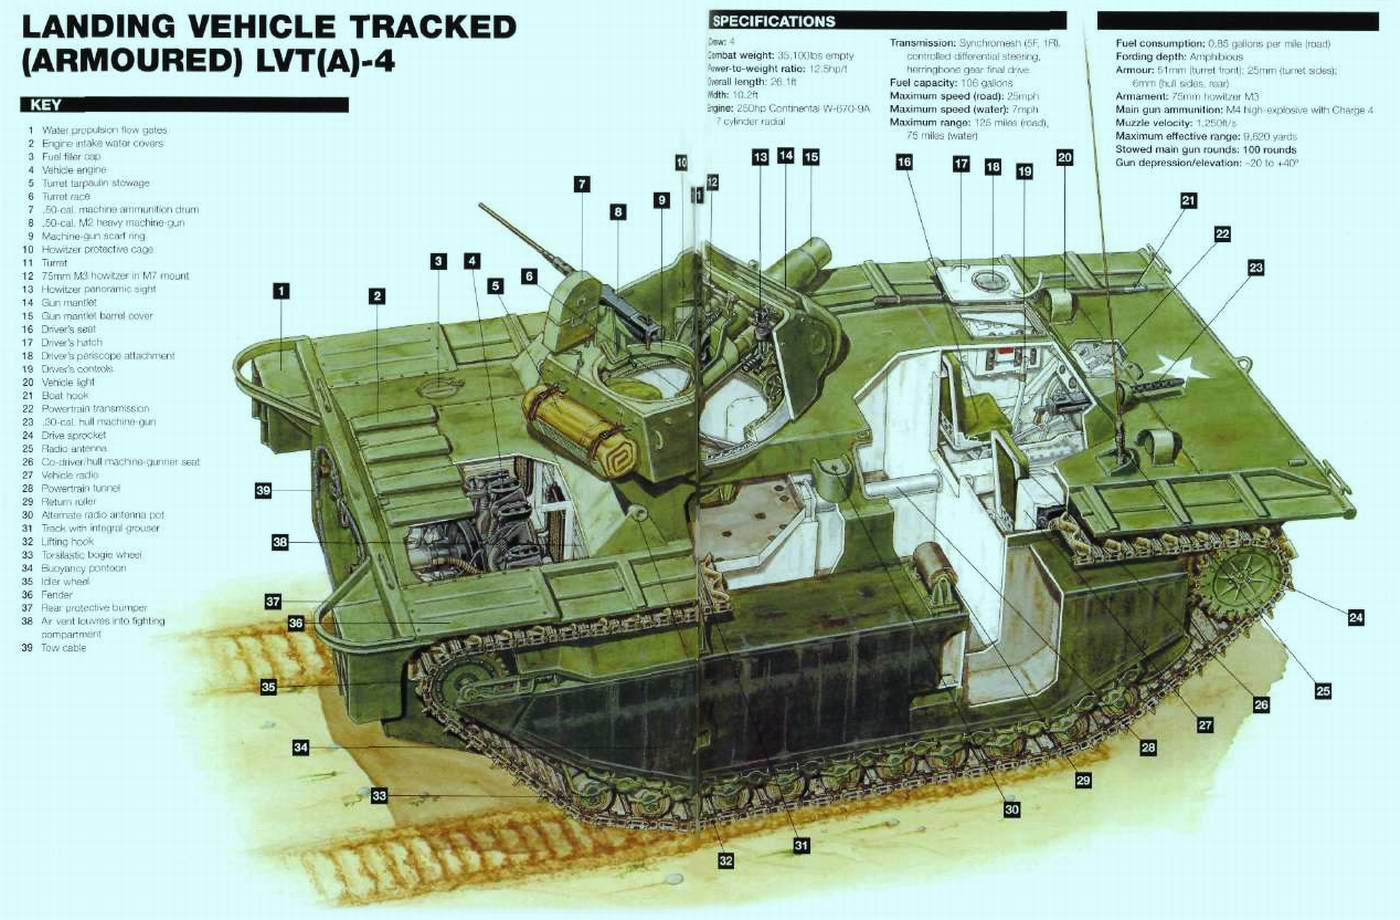 LVT(A)-4 Amtracs (1943 - 45 г.г.) - Амтрэк (плавающий трактор) - гусеничная десантная машина (США)